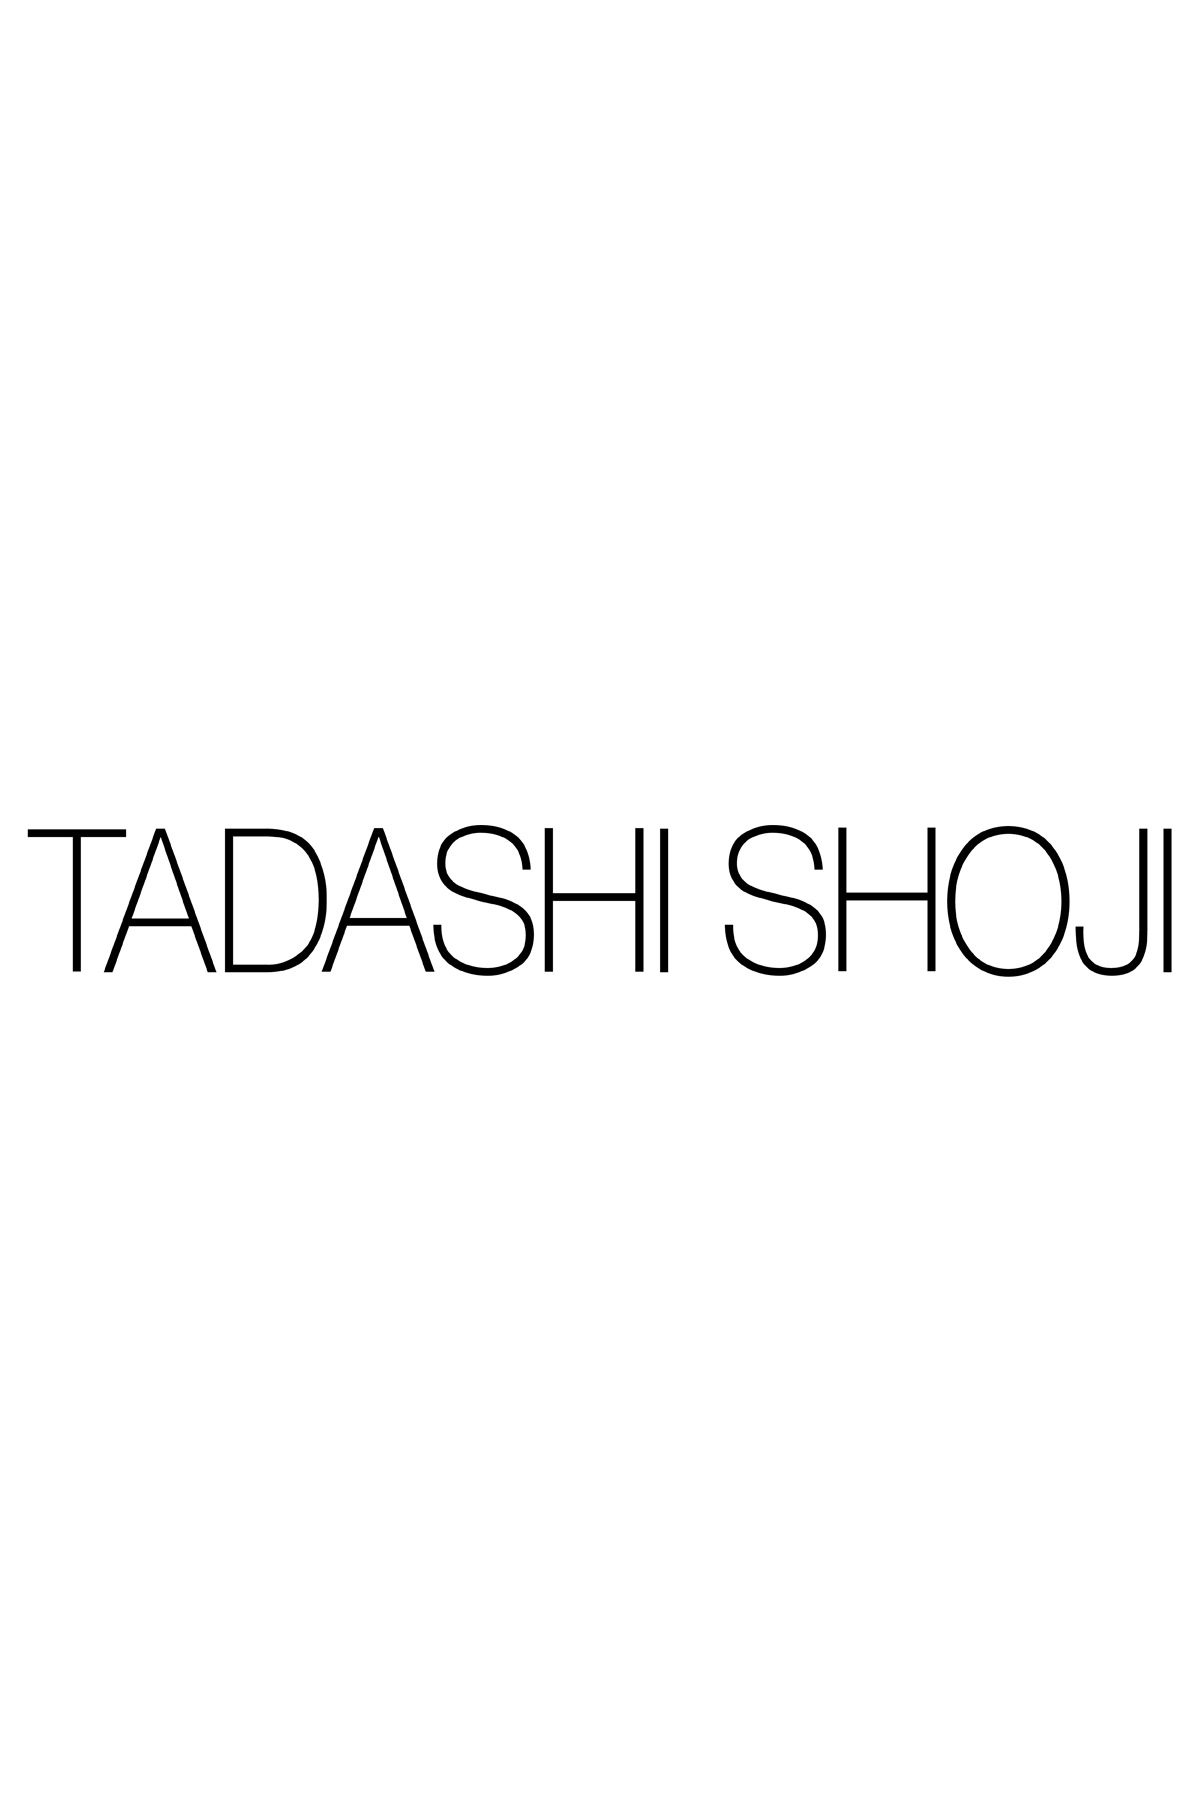 Tadashi Shoji - Corded Embroidery on Tulle Cap Sleeve Dress - Detail